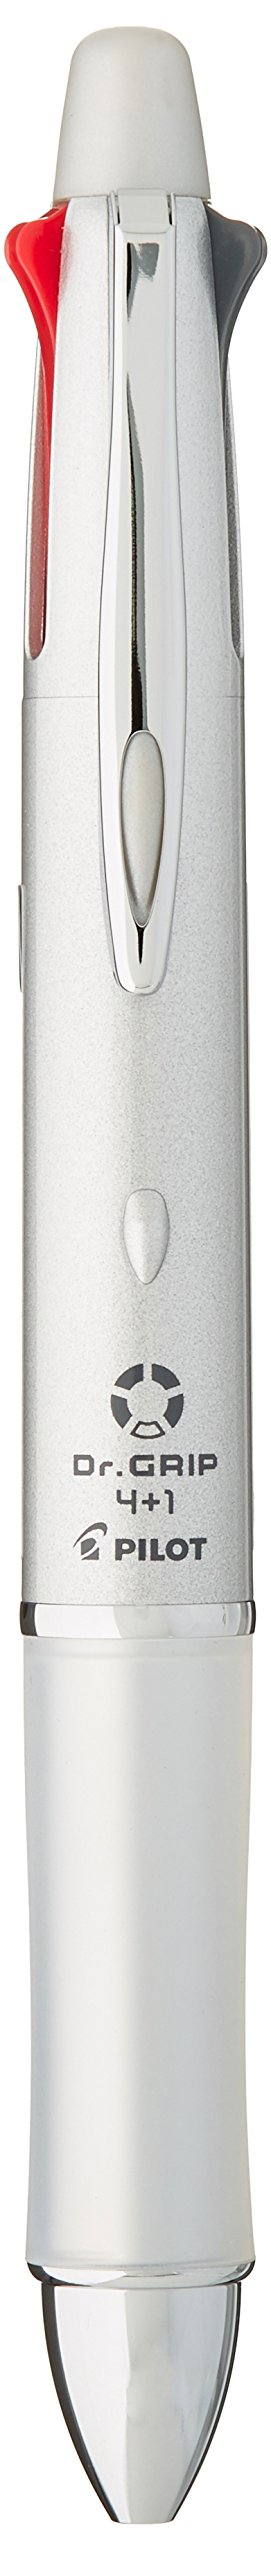 Pilot Mult Function Pen Dr. Grip 4+1, 0.7mm Acro Ink Ballpoint Pen, 0.5mm Mechanical Pencil, Silver (BKHDF1SF-SP) by Pilot (Image #1)